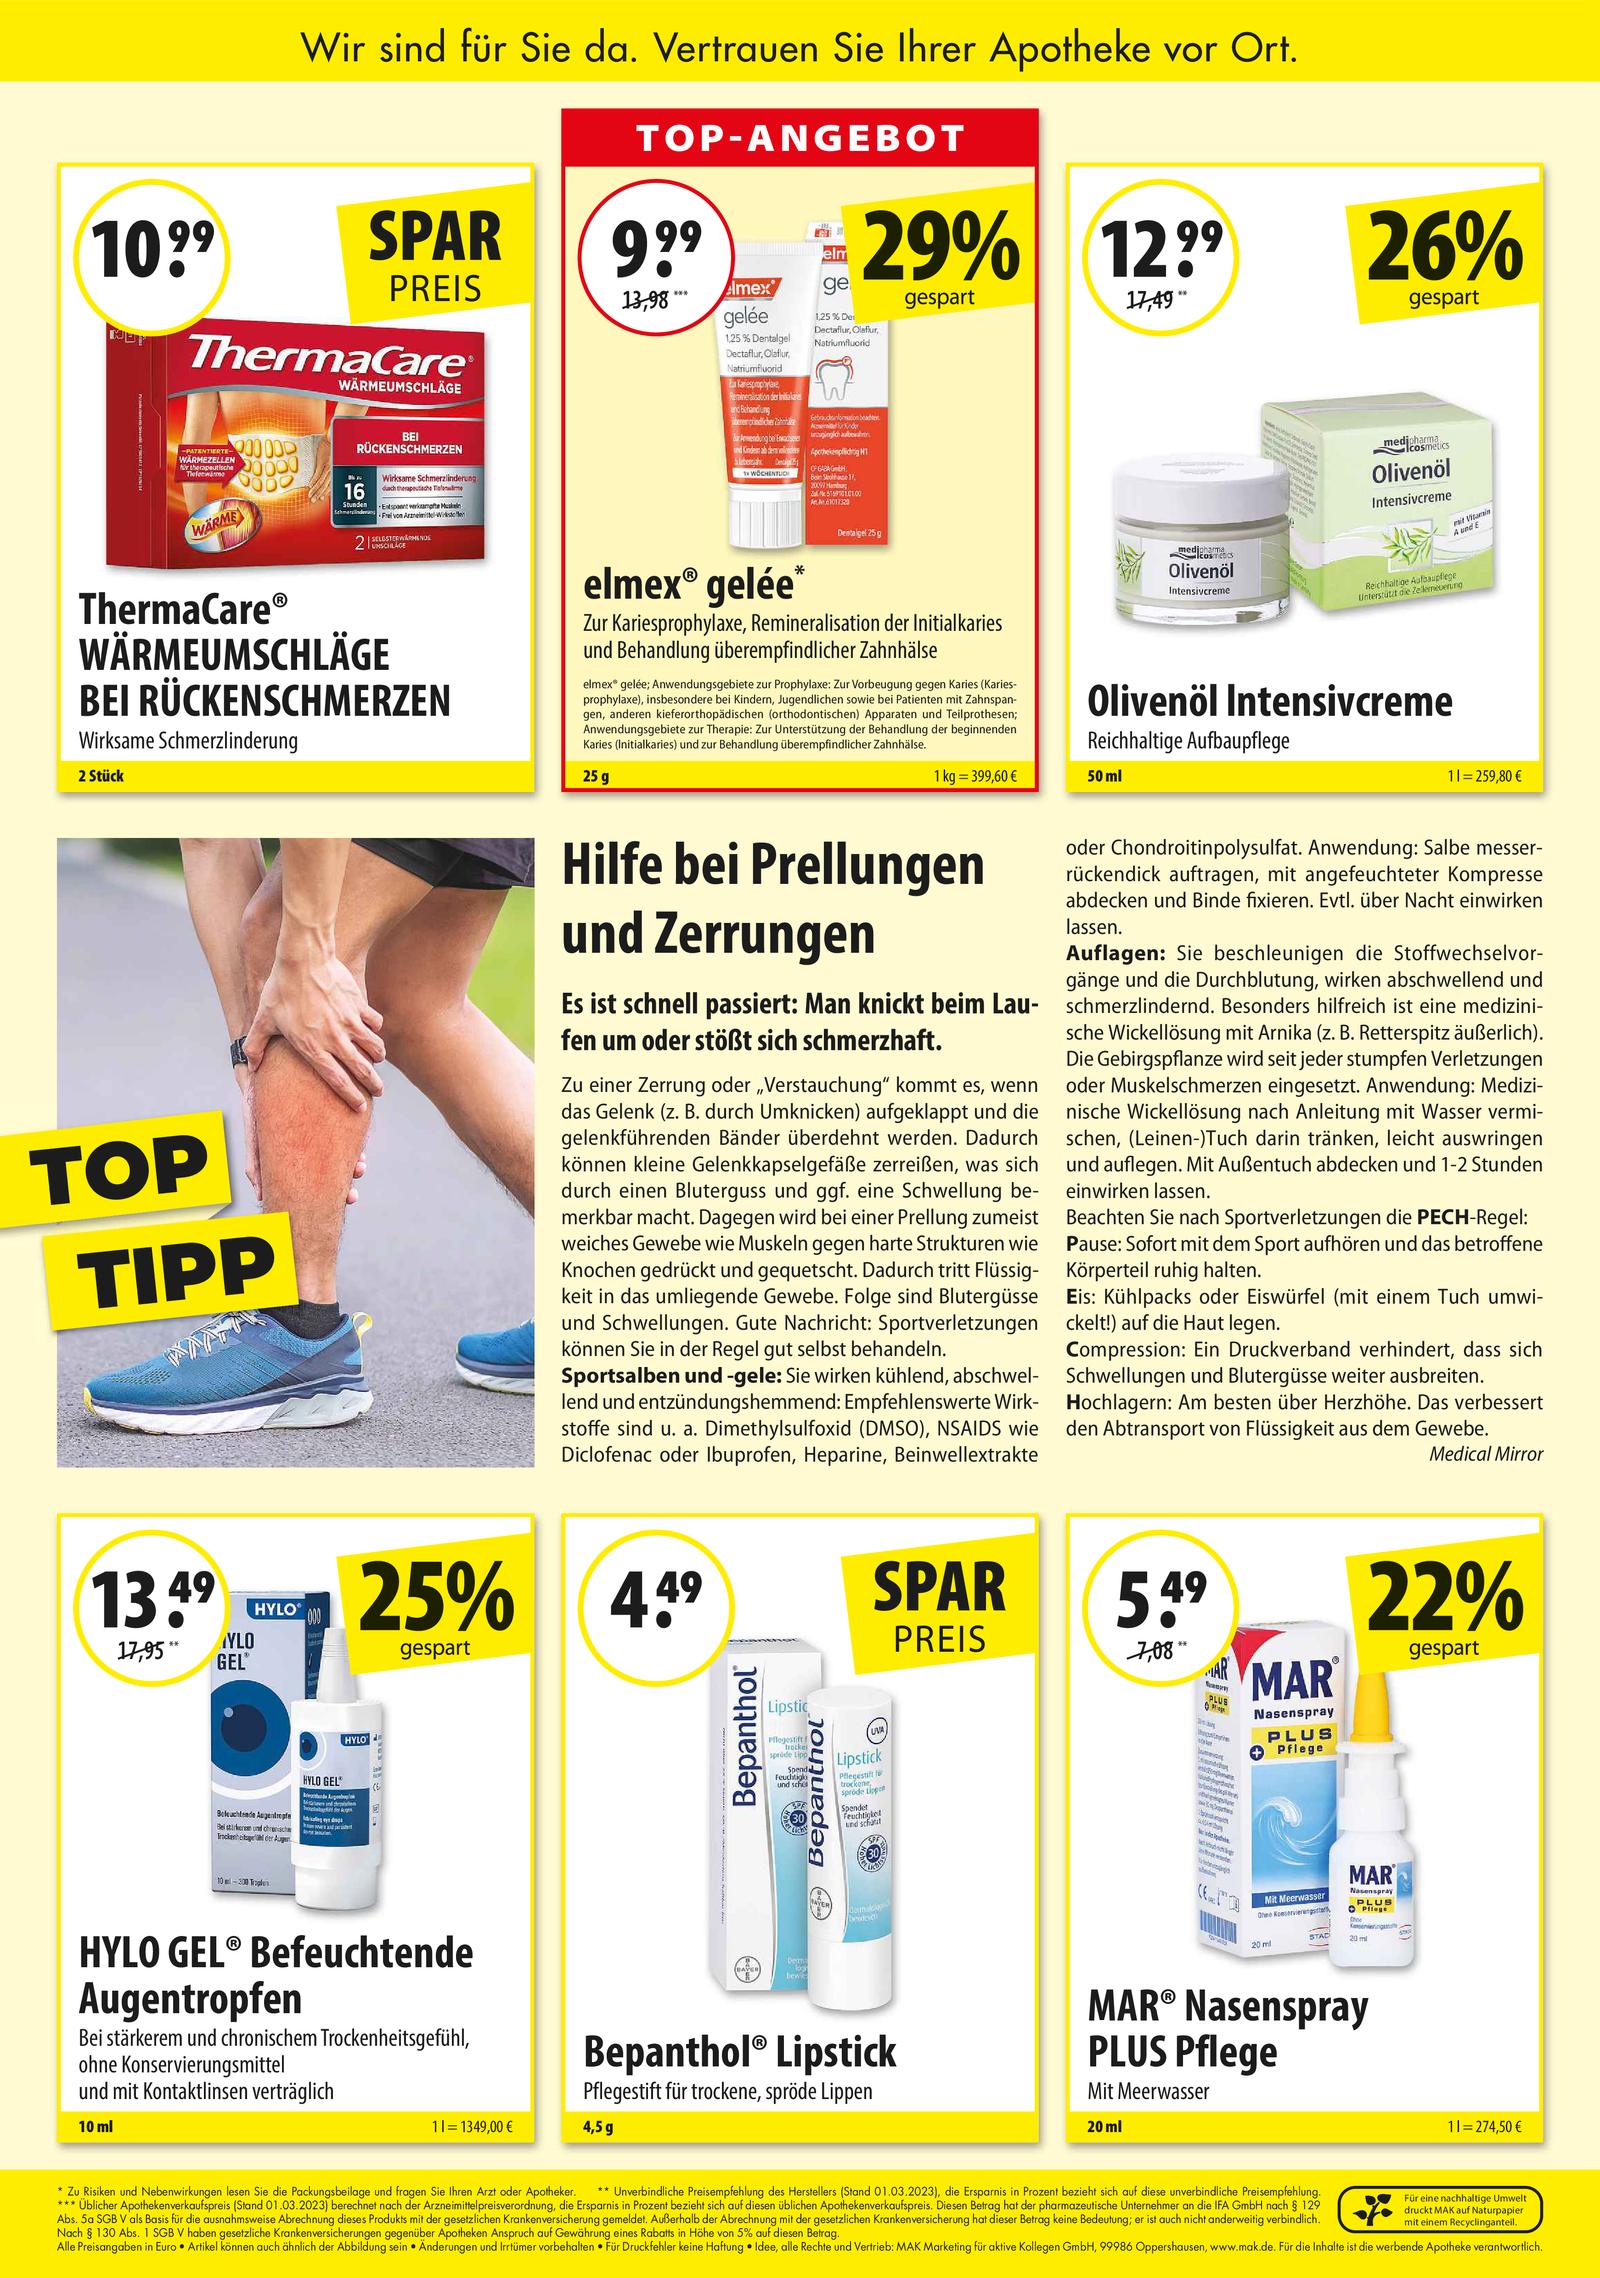 https://mein-uploads.apocdn.net/9378/leaflets/9378_flyer-Seite2.png